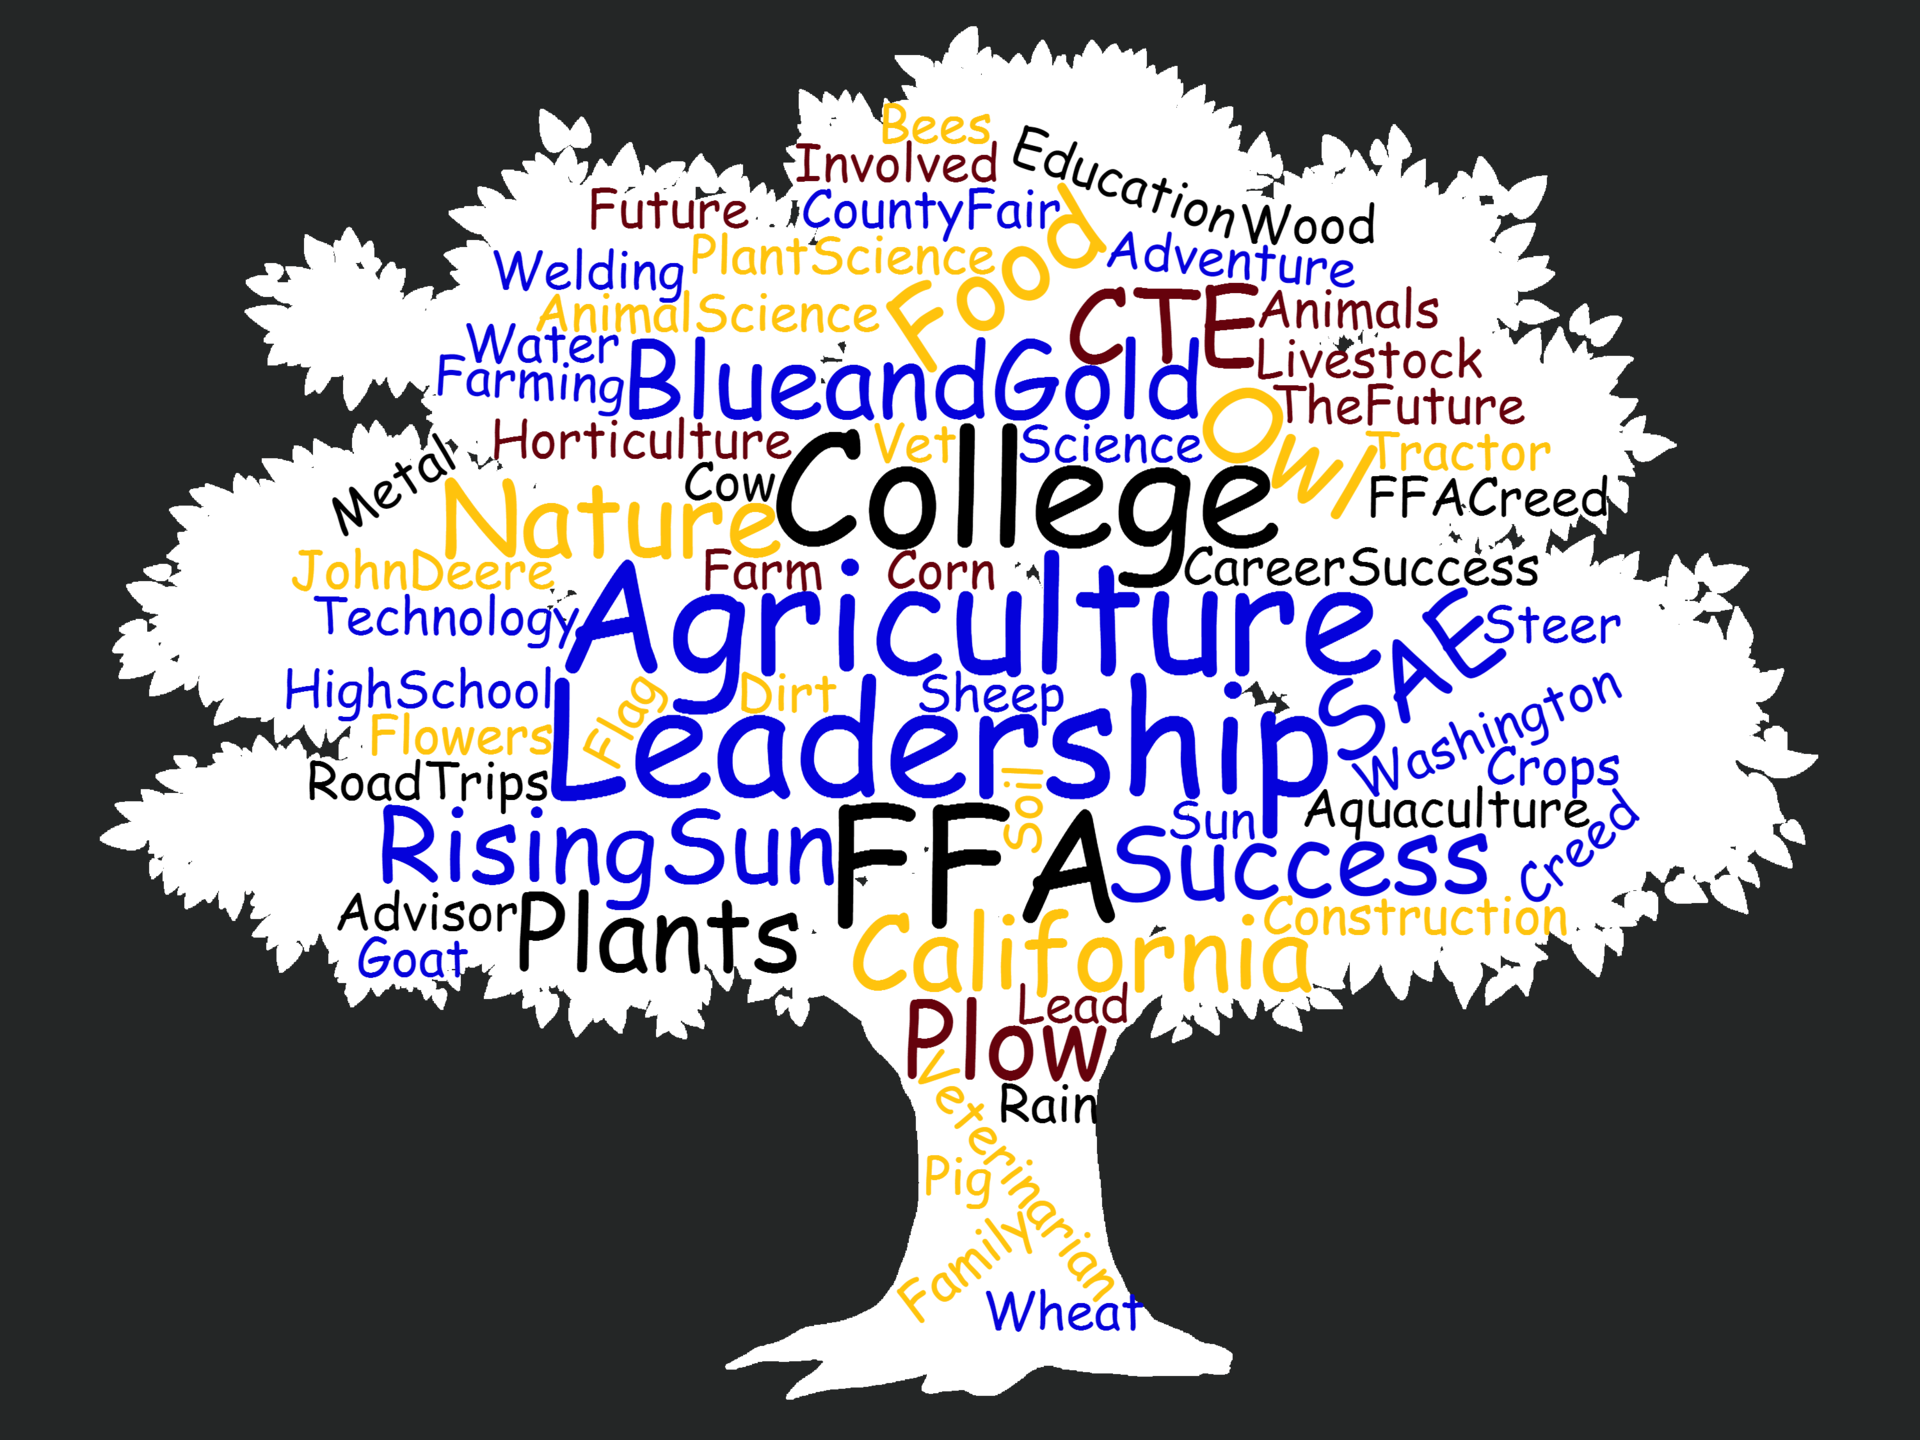 WV FFA. Growing tomorrow's leaders today.